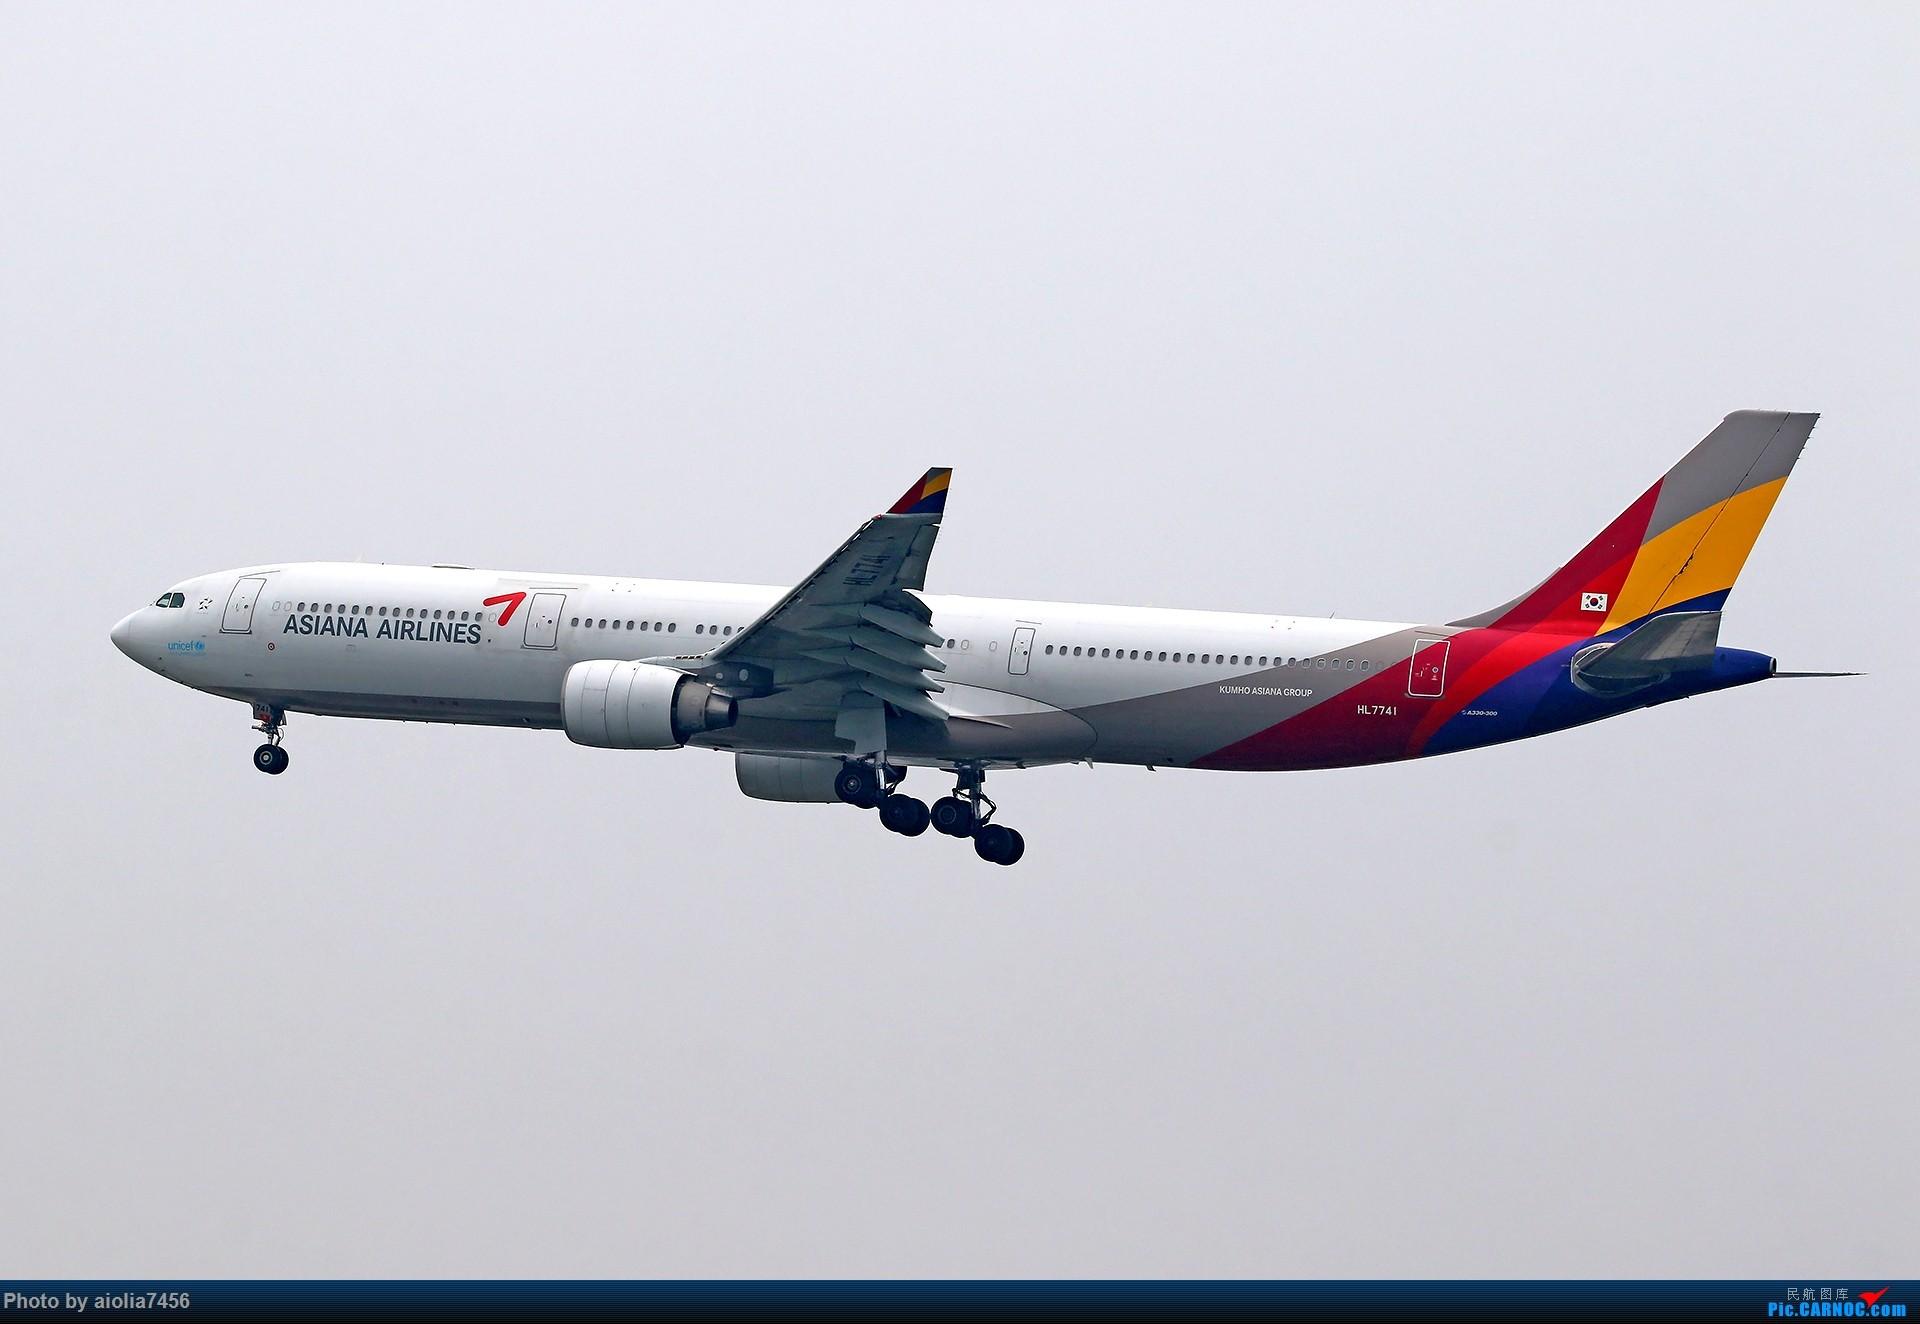 Re:[原创][合肥飞友会]上海打鸡-水泥天的虹桥 AIRBUS A330-300 HL7441 中国上海虹桥国际机场